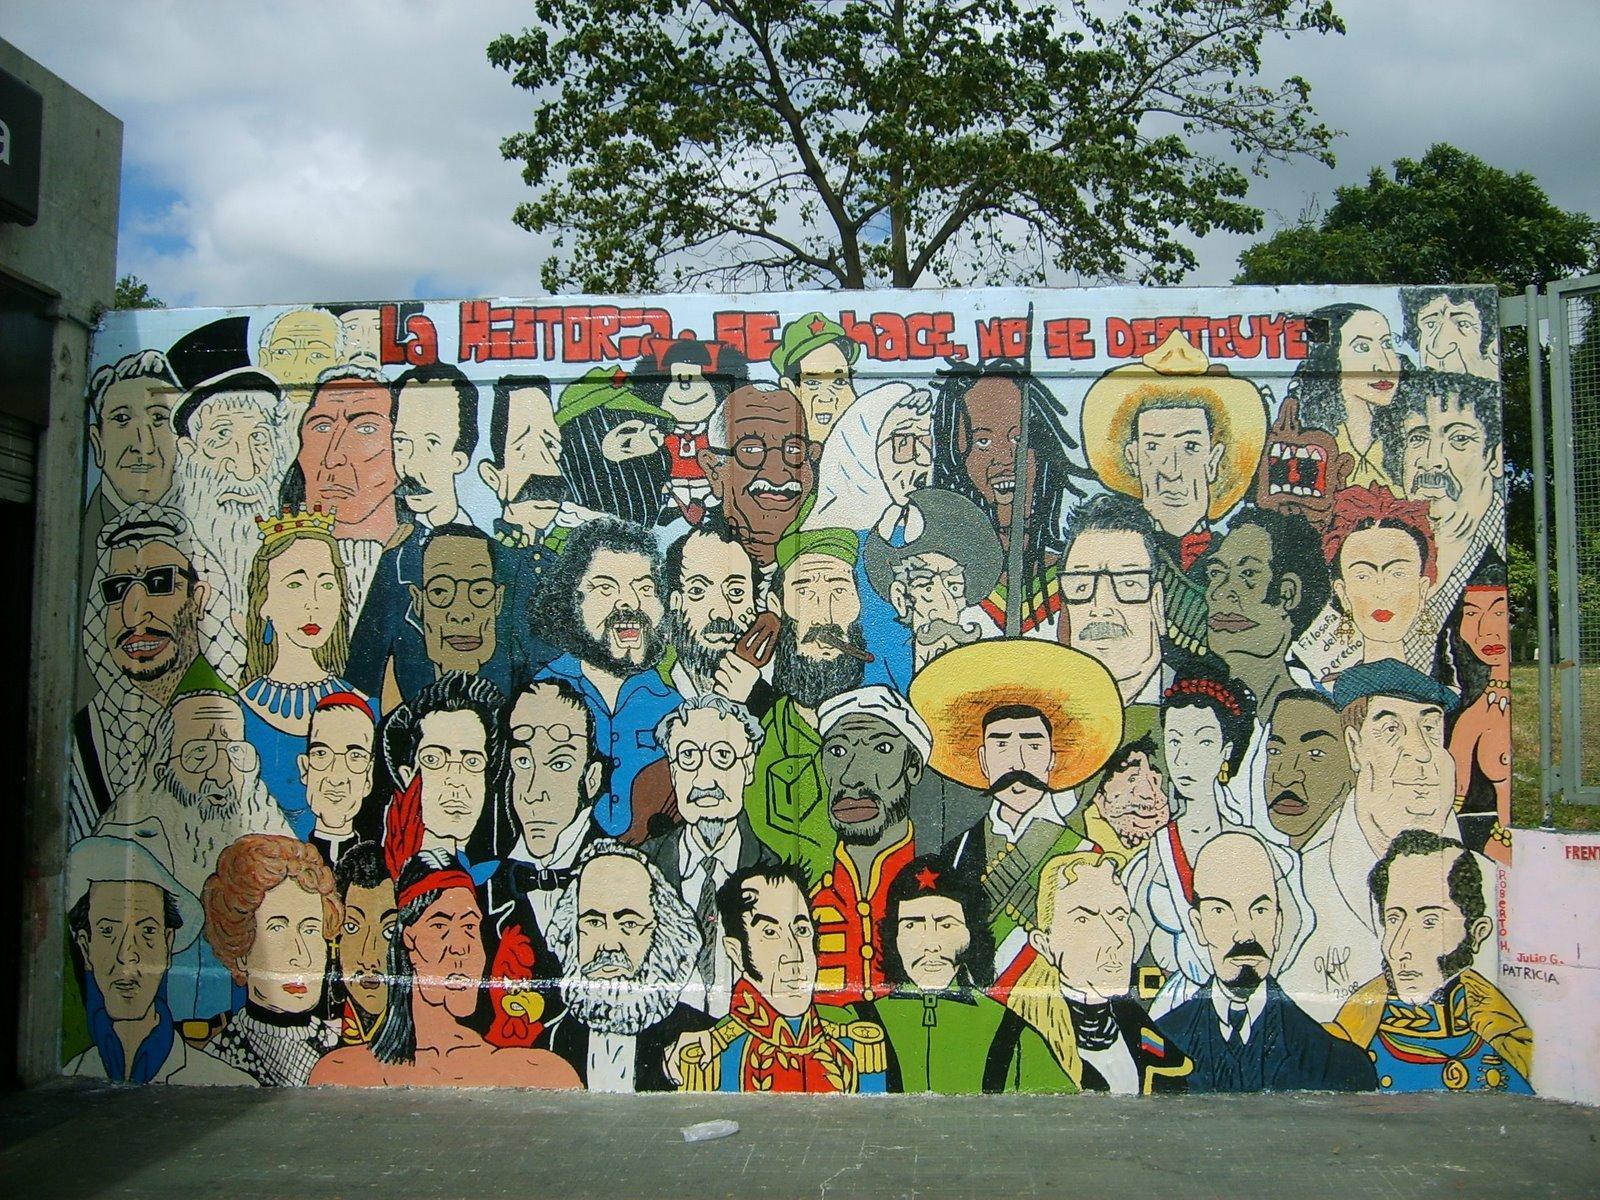 http://www.resistir.info/venezuela/imagens/mural_venezuela.jpg